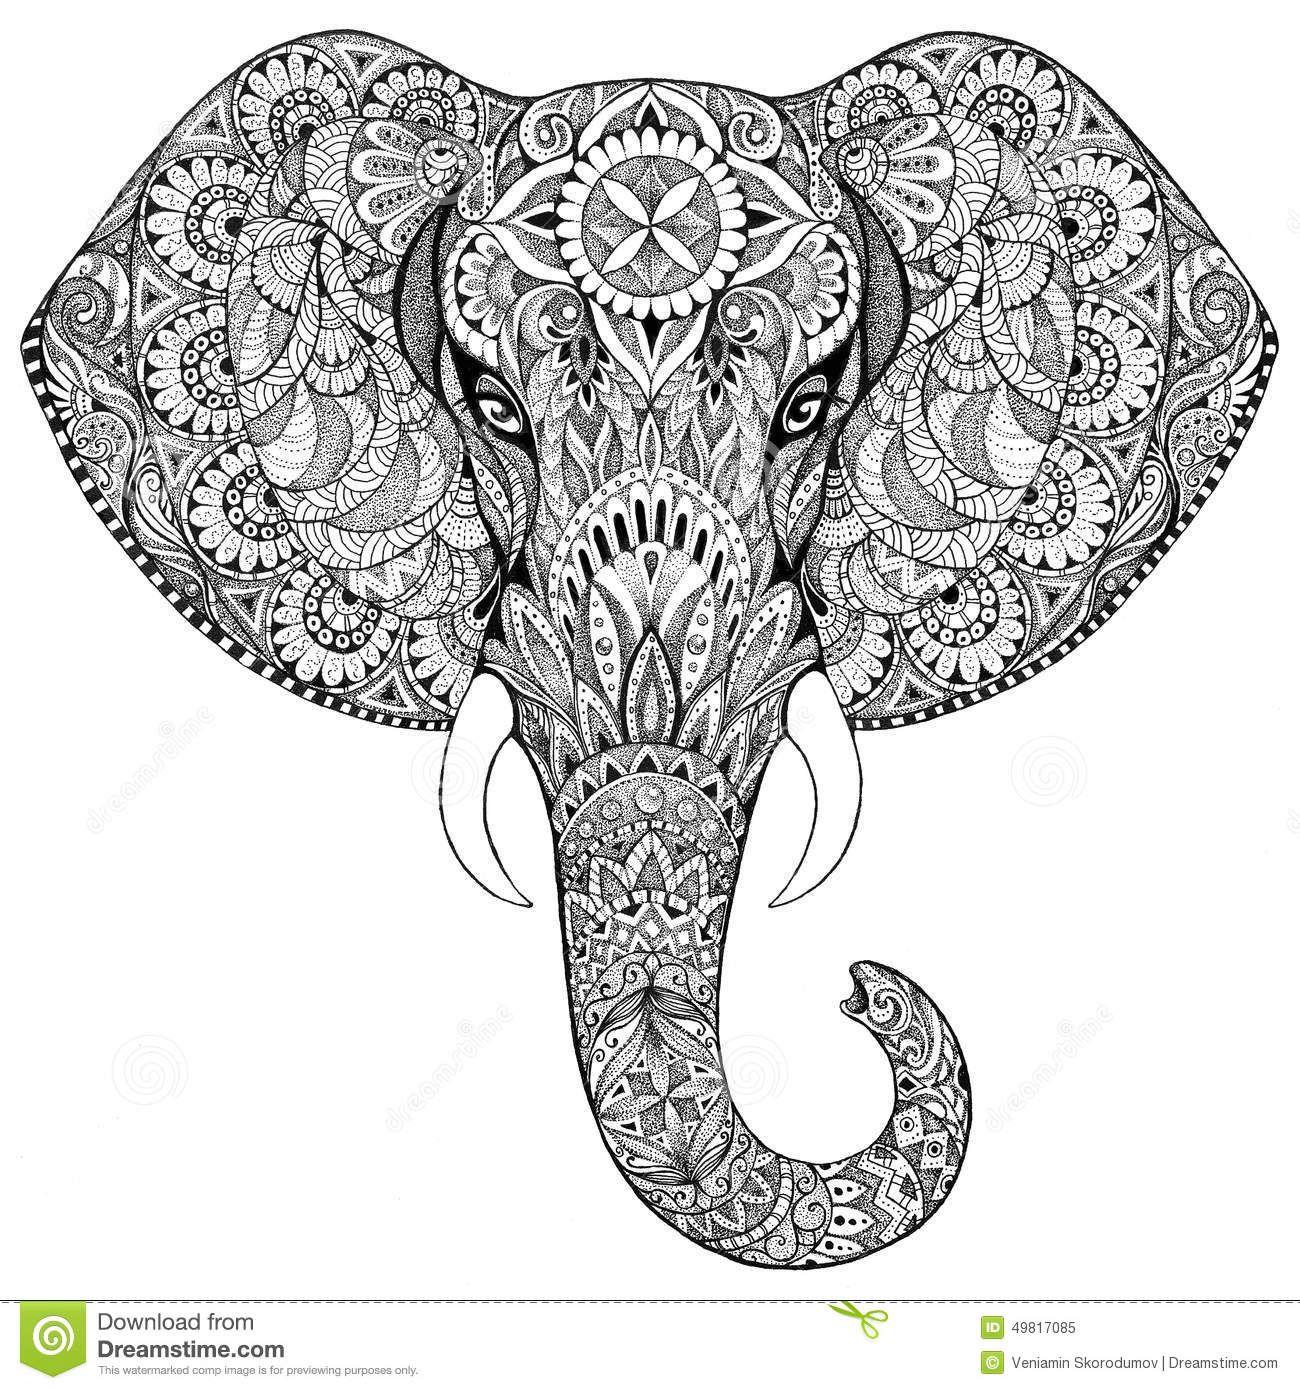 Indien Illustrations 99 289 Indien Illustrations Vecteurs